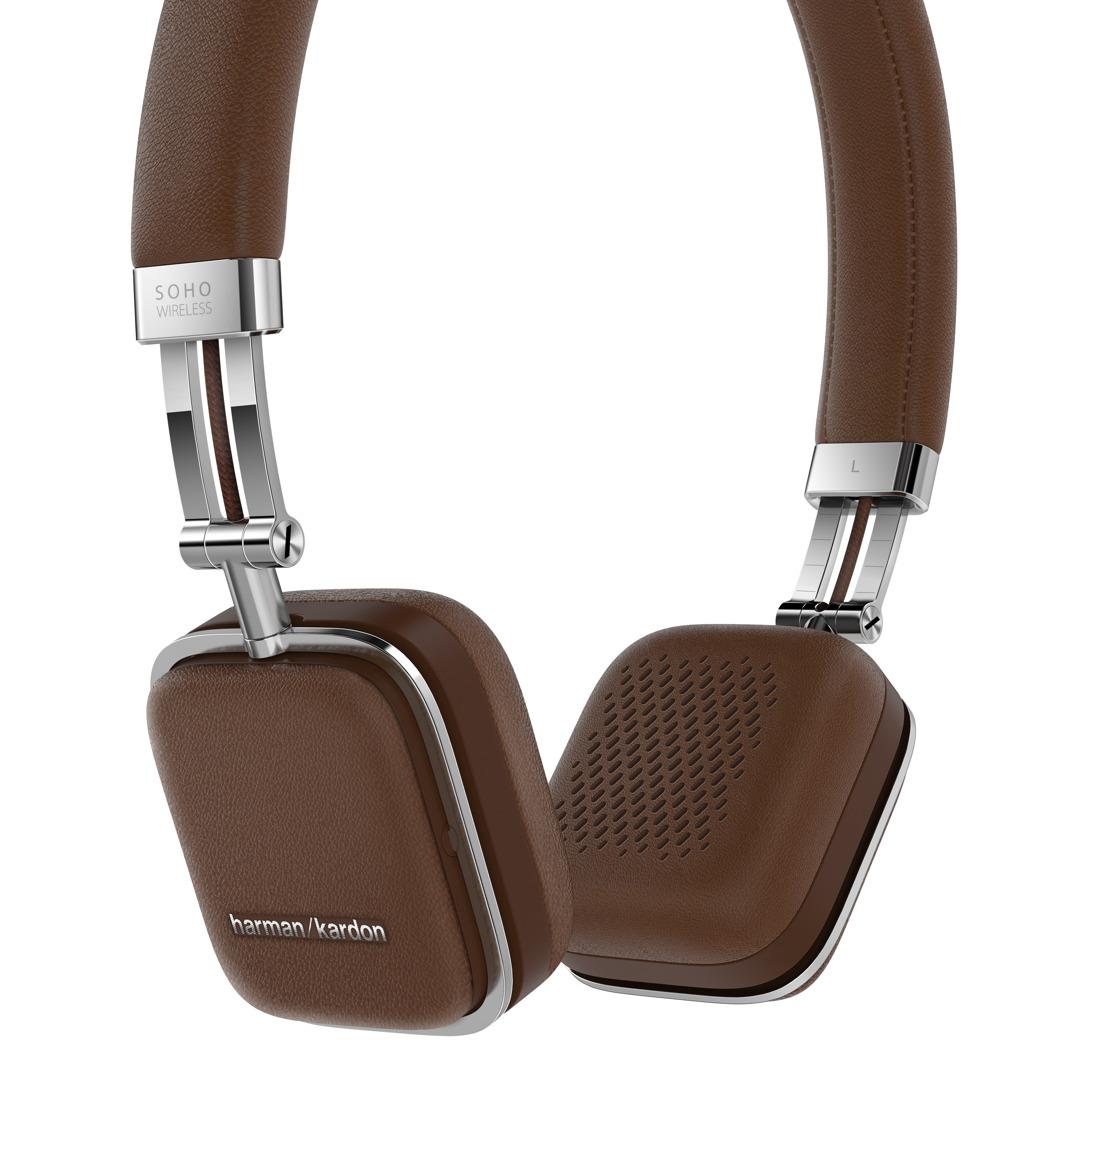 IFA 2014: HARMAN lanserar trådlösa hörlurarna Harman Kardon Soho Wireless